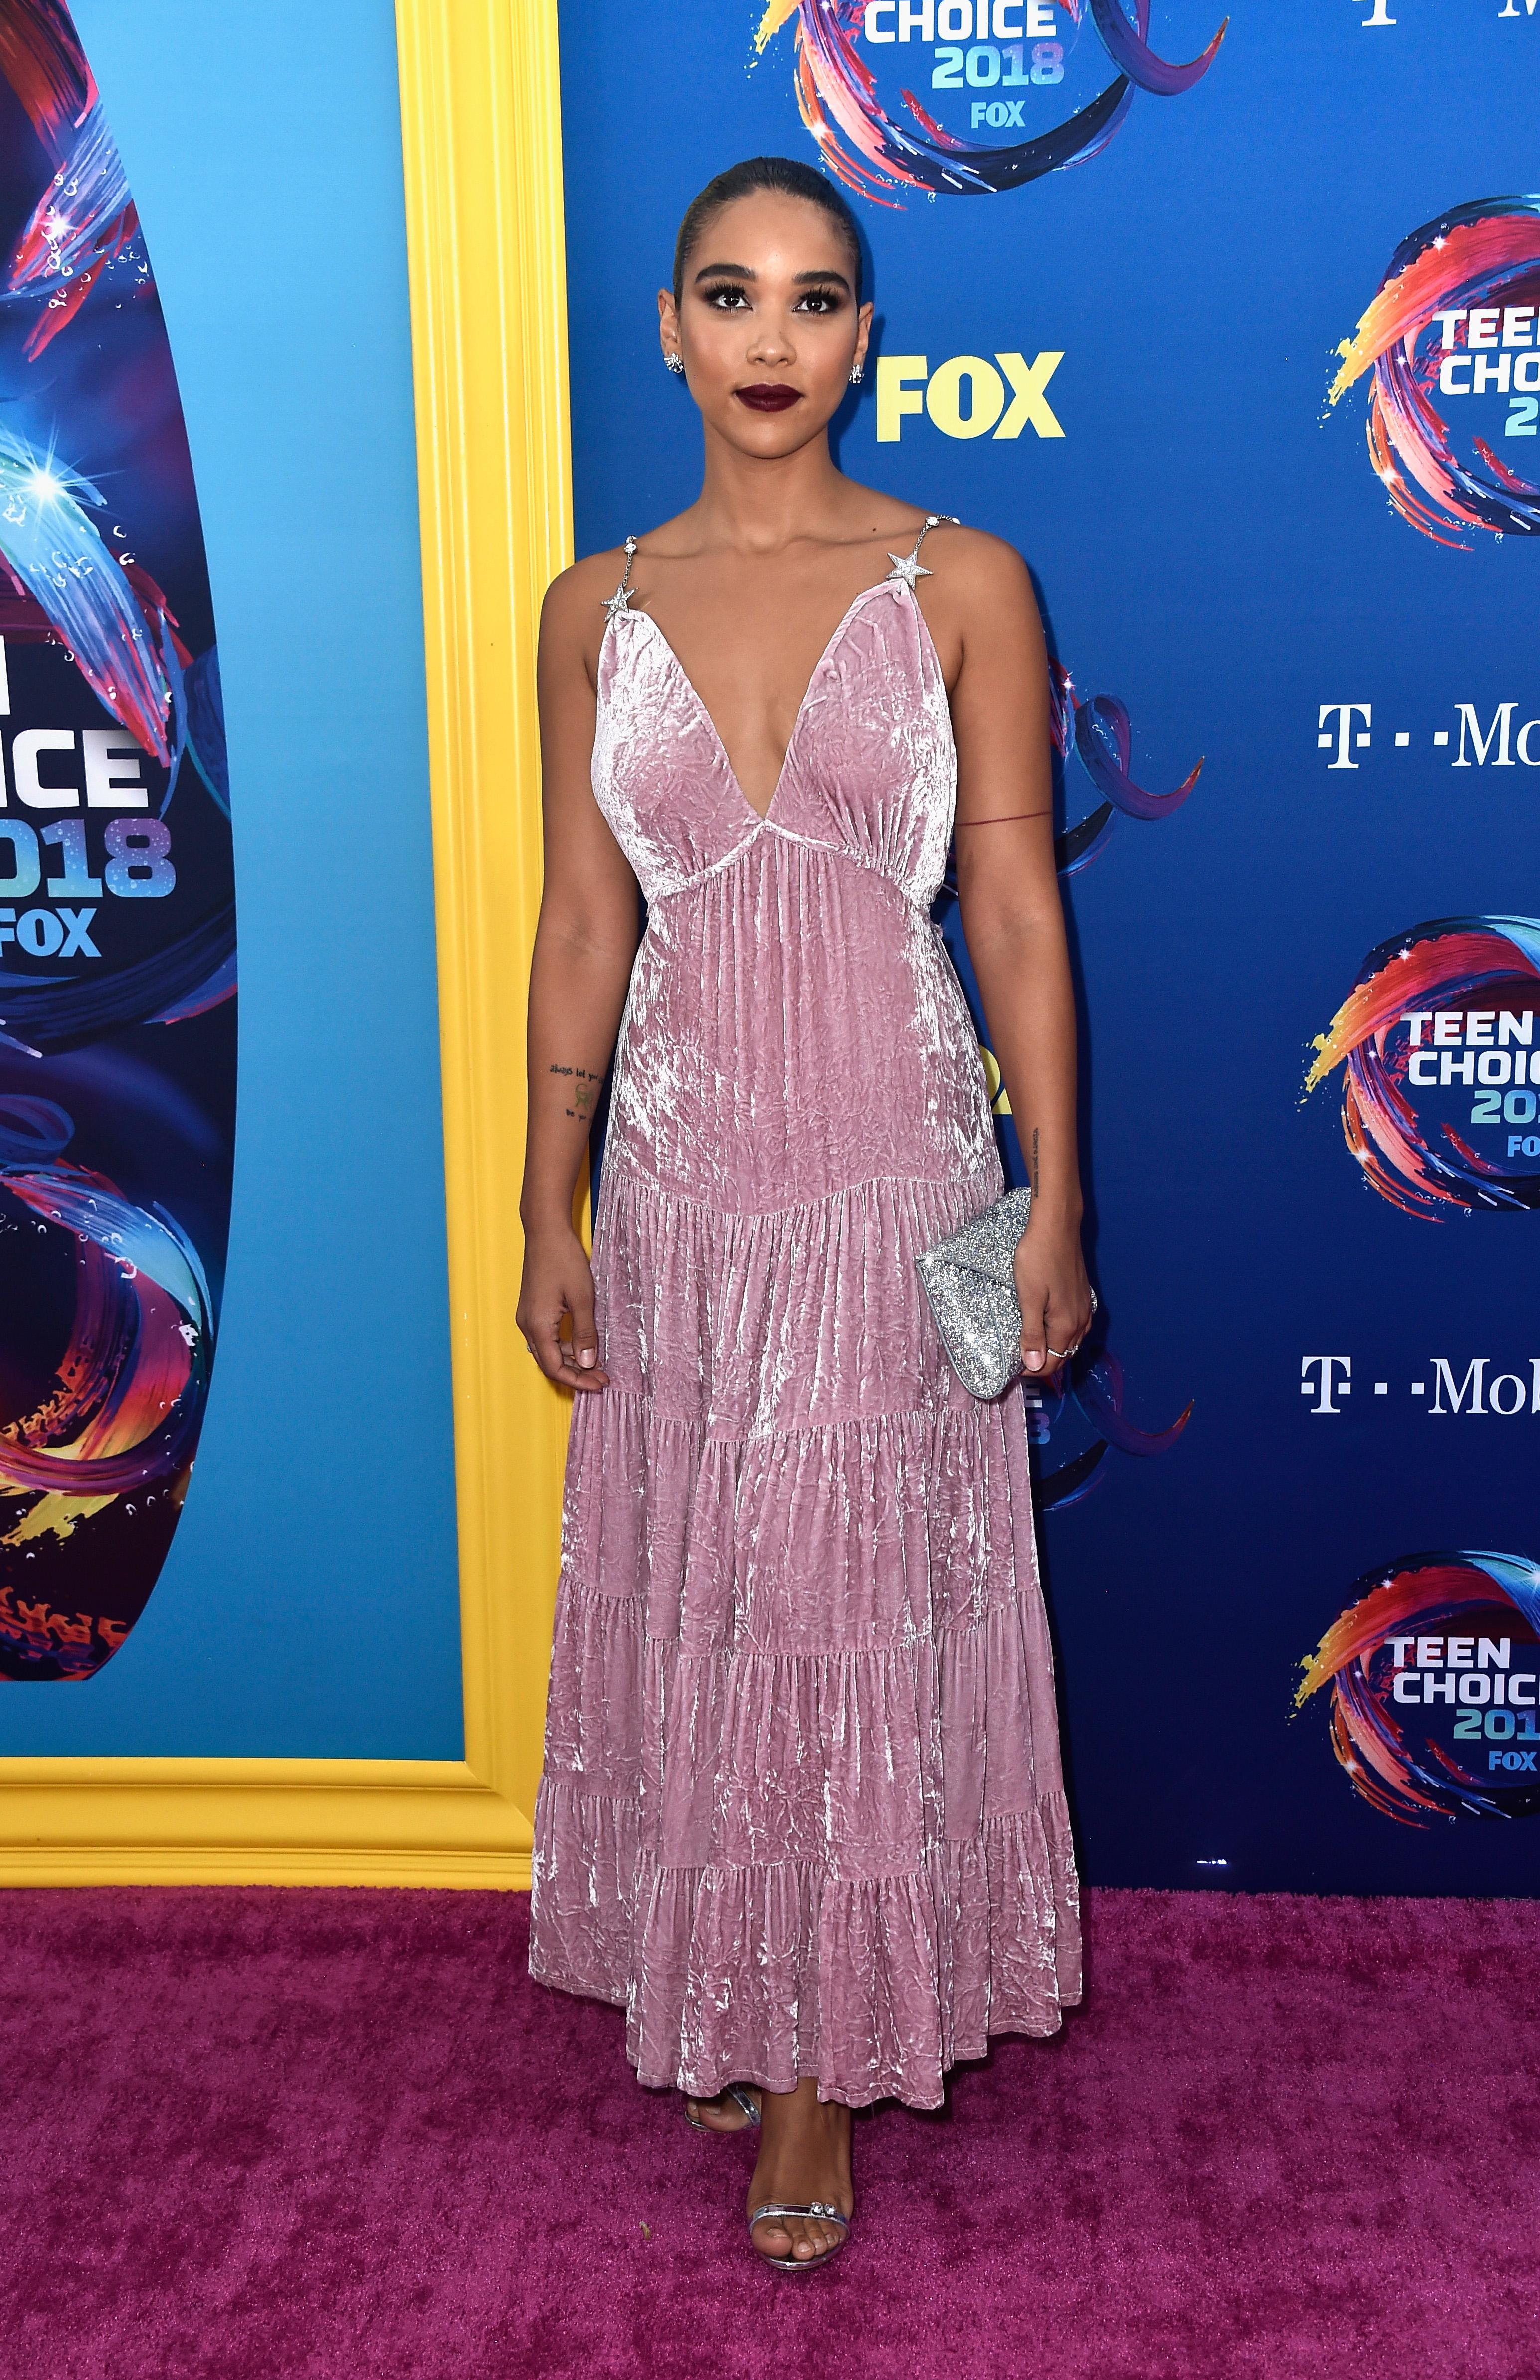 alexandra shipp no red carpet do Teen Choice Awards 2018.